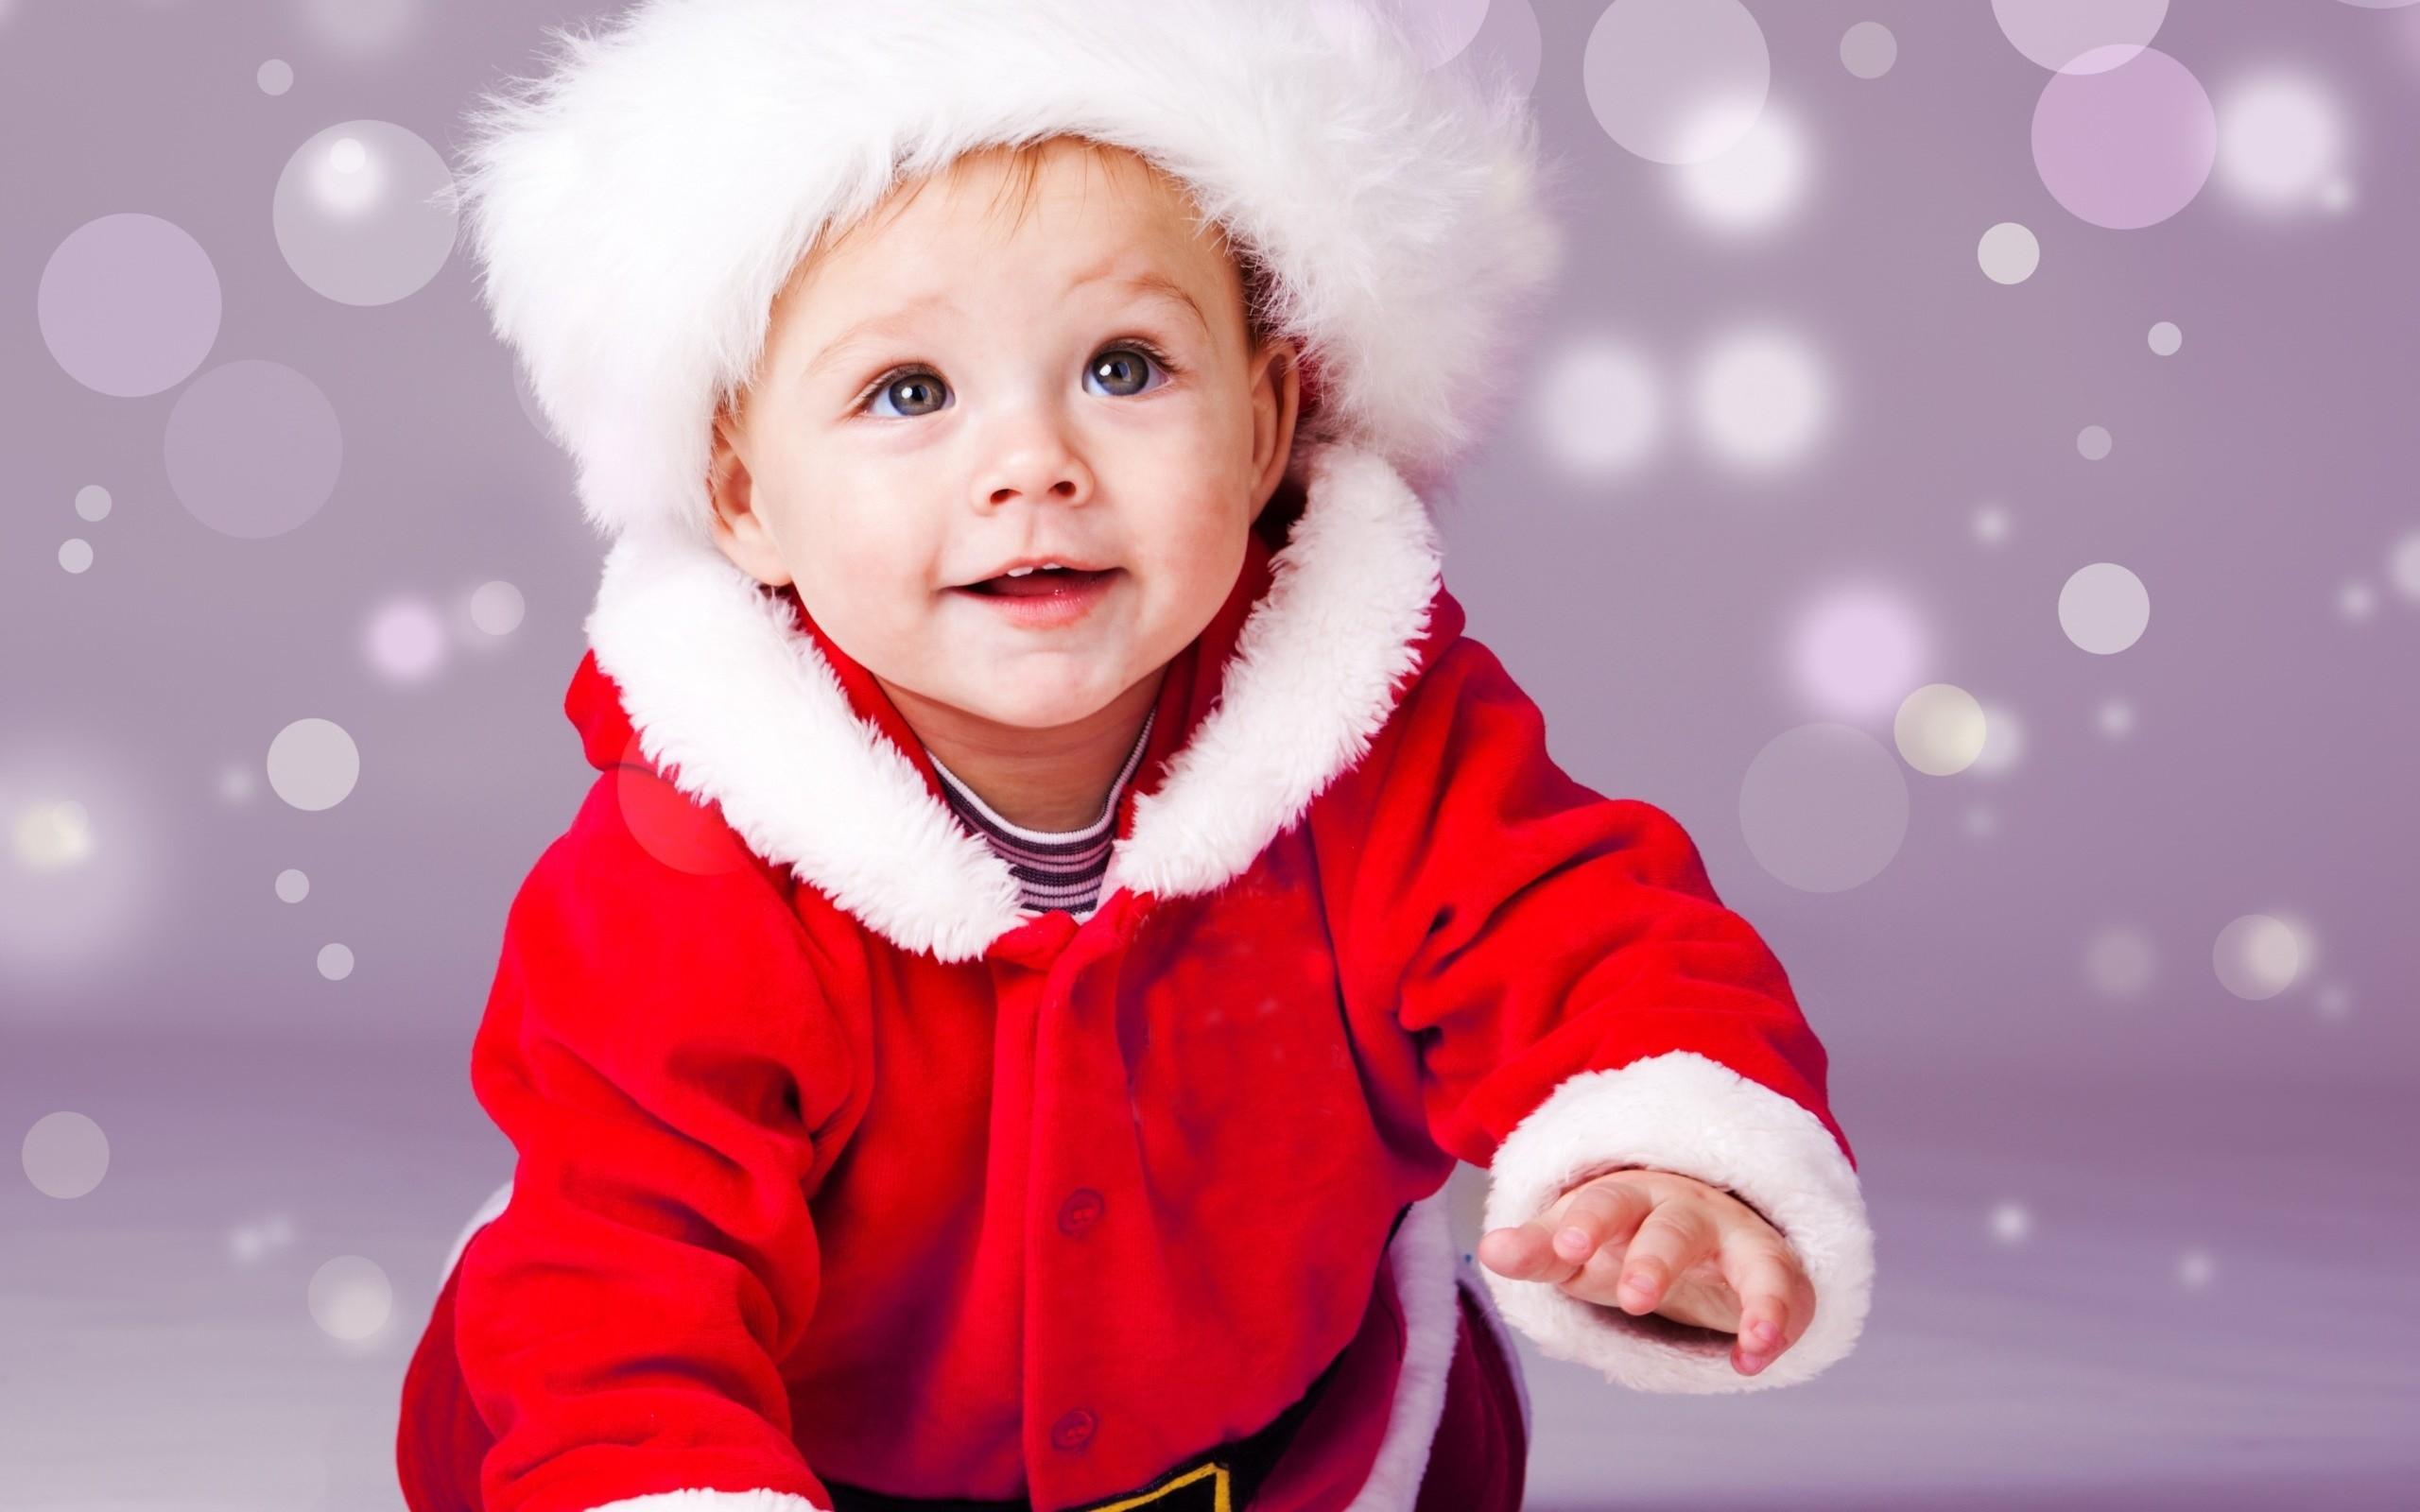 Cute Baby Santa Hat Wallpapers HD Wallpapers 1280×1024 Cute Santa Wallpapers  (46 Wallpapers) | Adorable Wallpapers | Desktop | Pinterest | Wallpaper and  Hd …